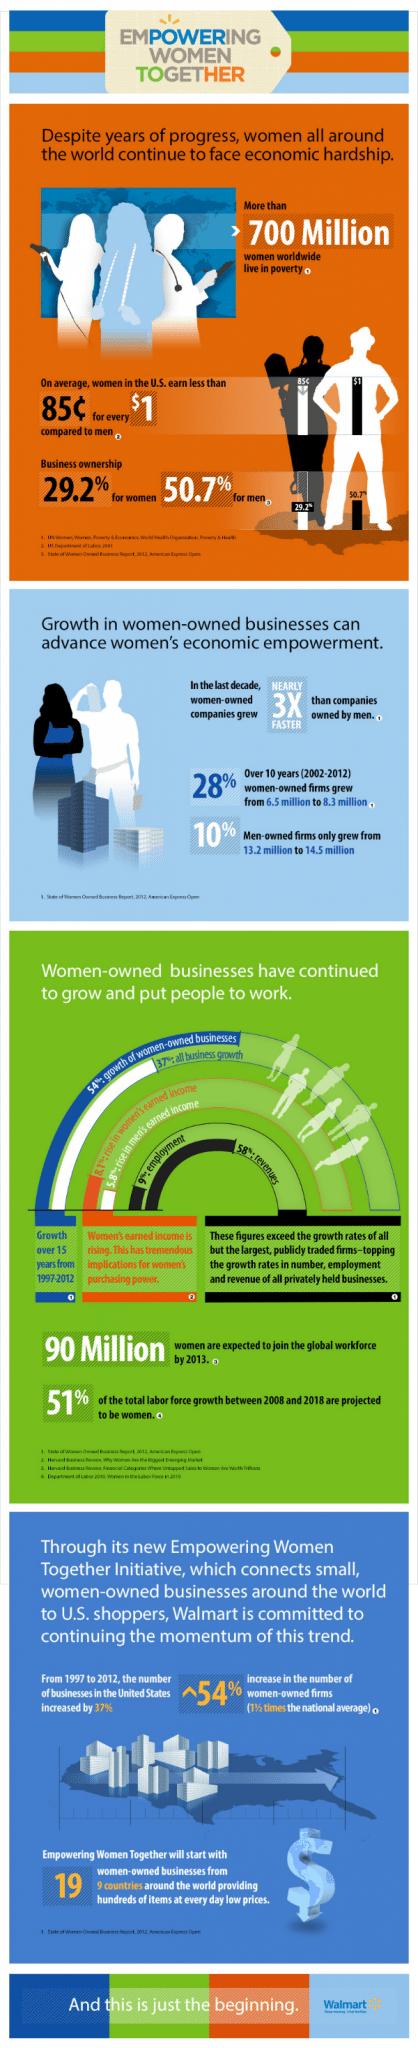 Walmart Empowering Women Infographic